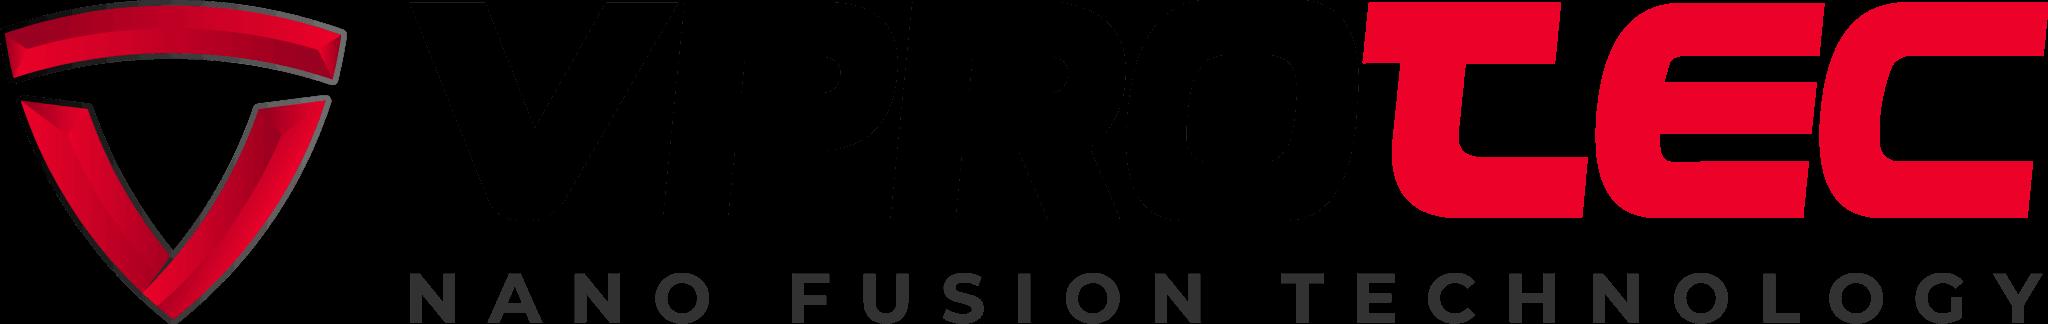 vprotec-logo2-copy-1.png